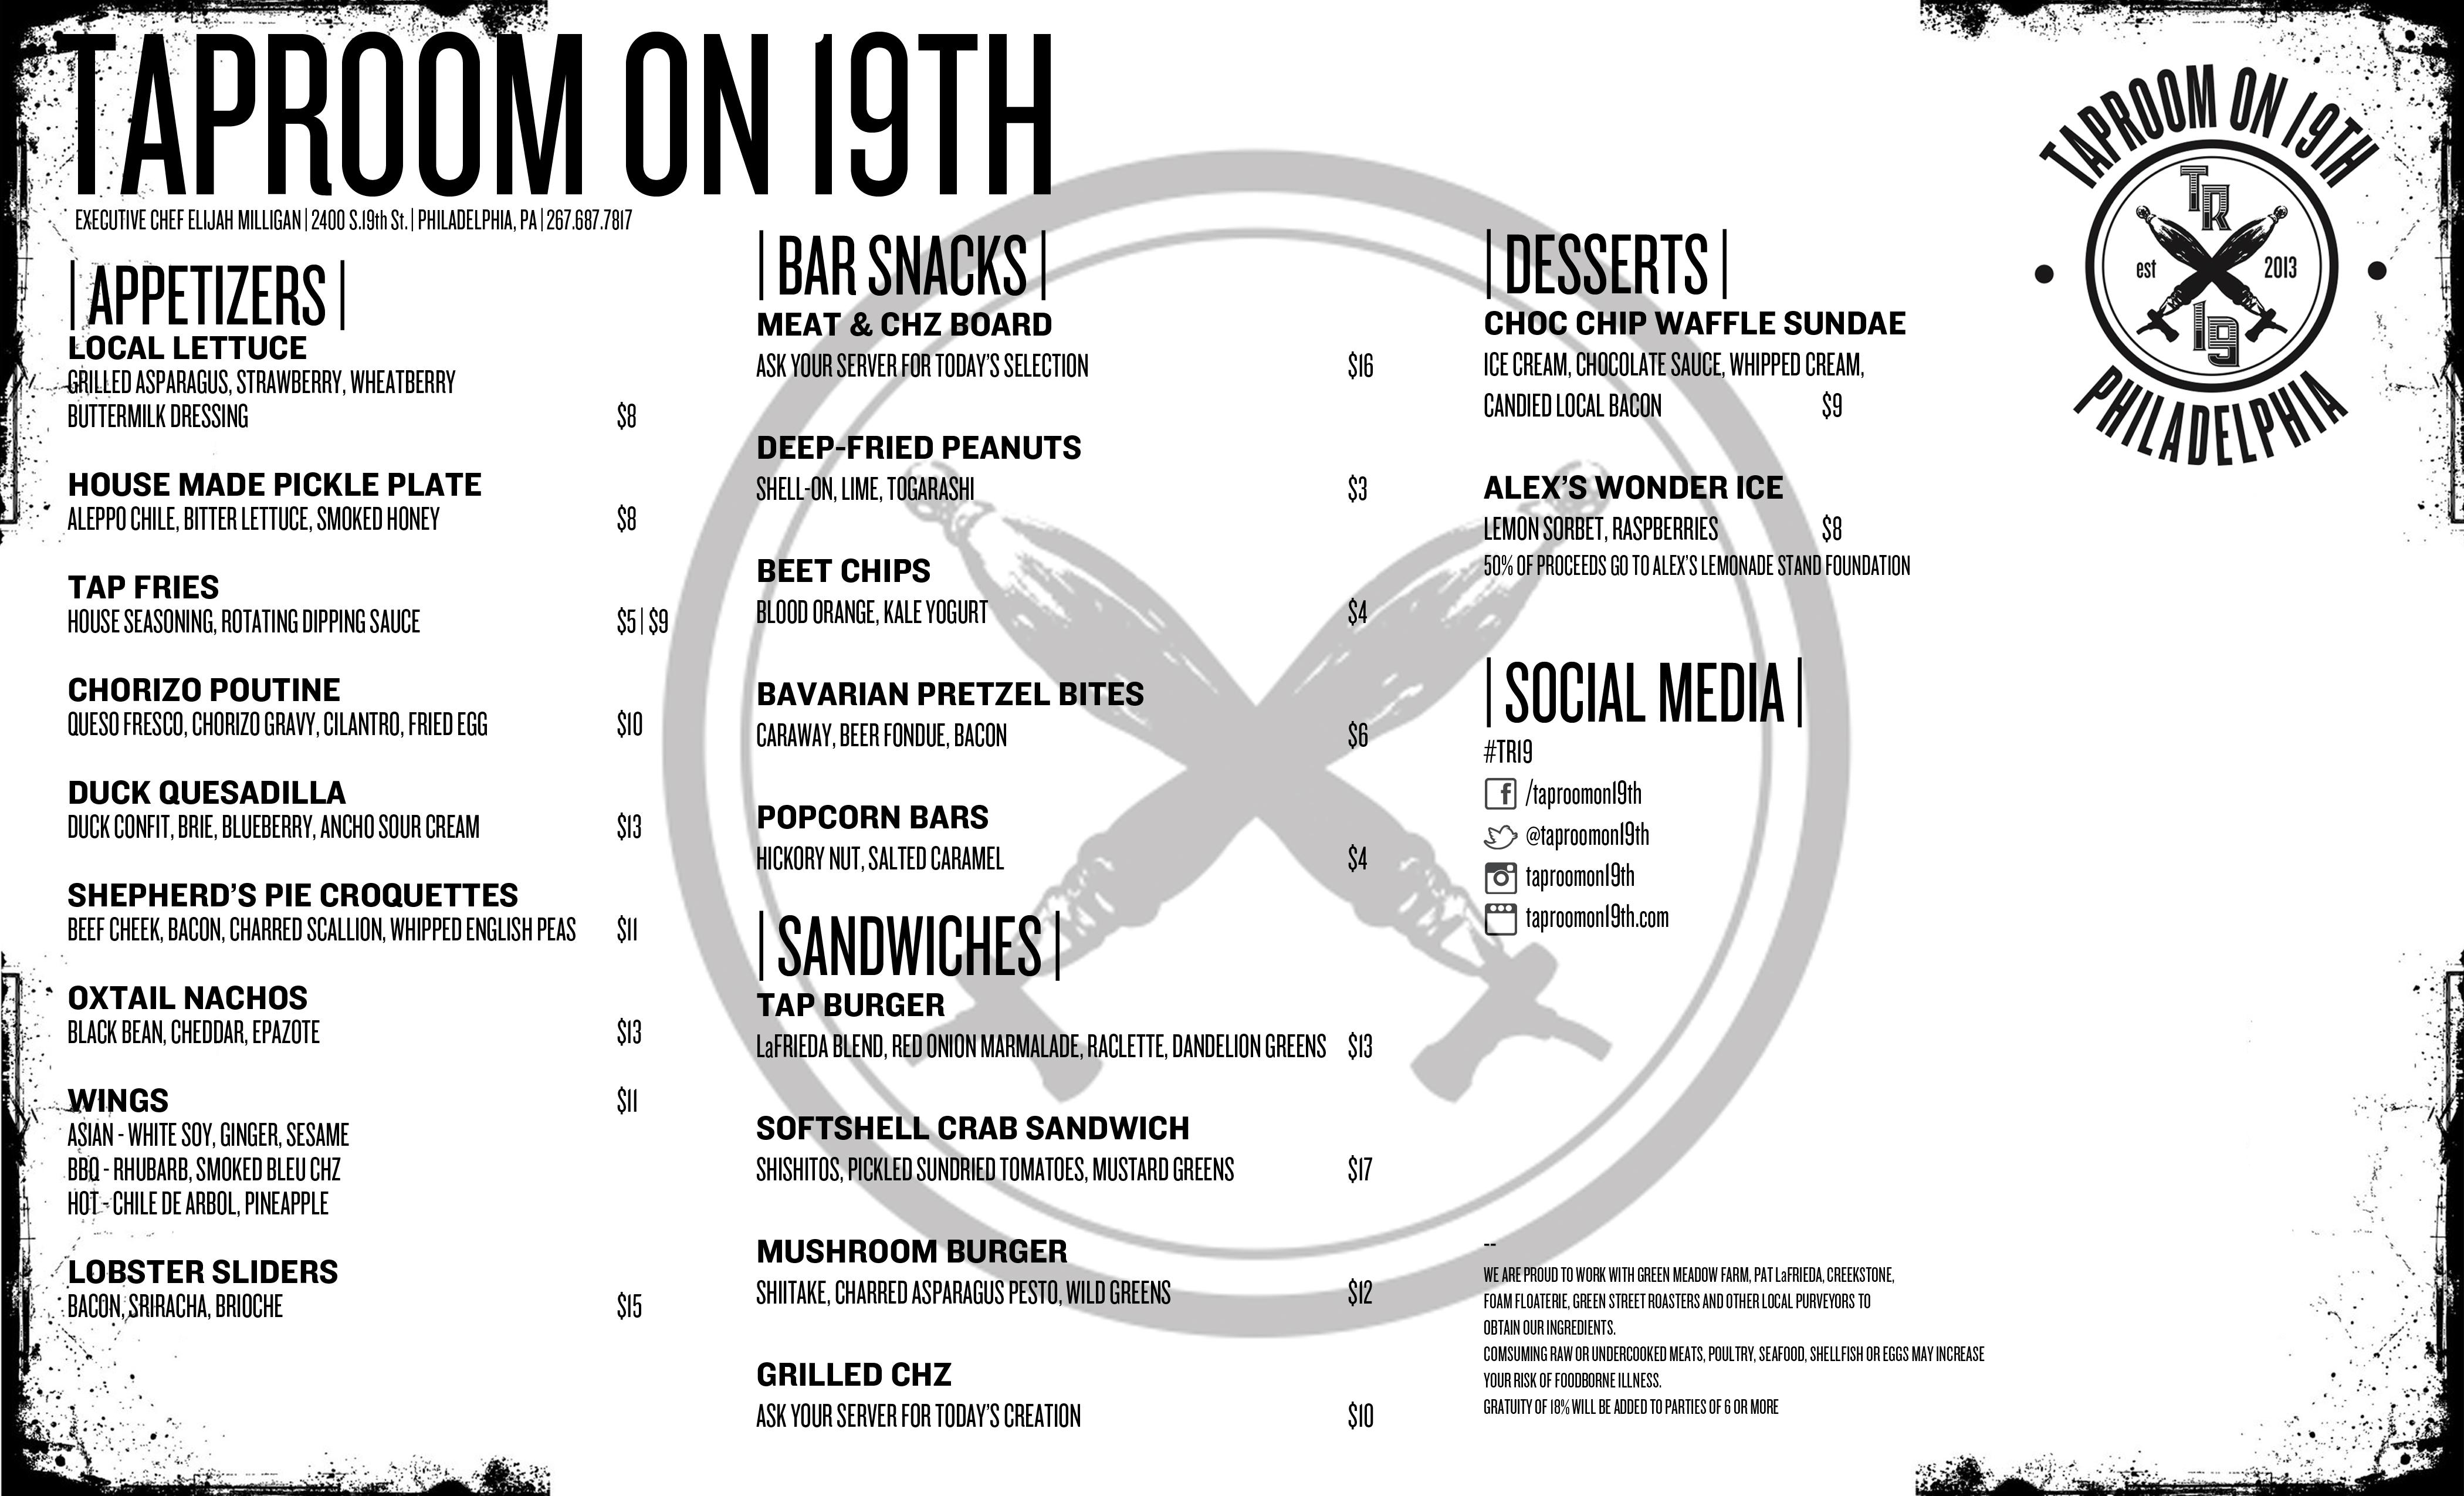 taproom on 19th new menu